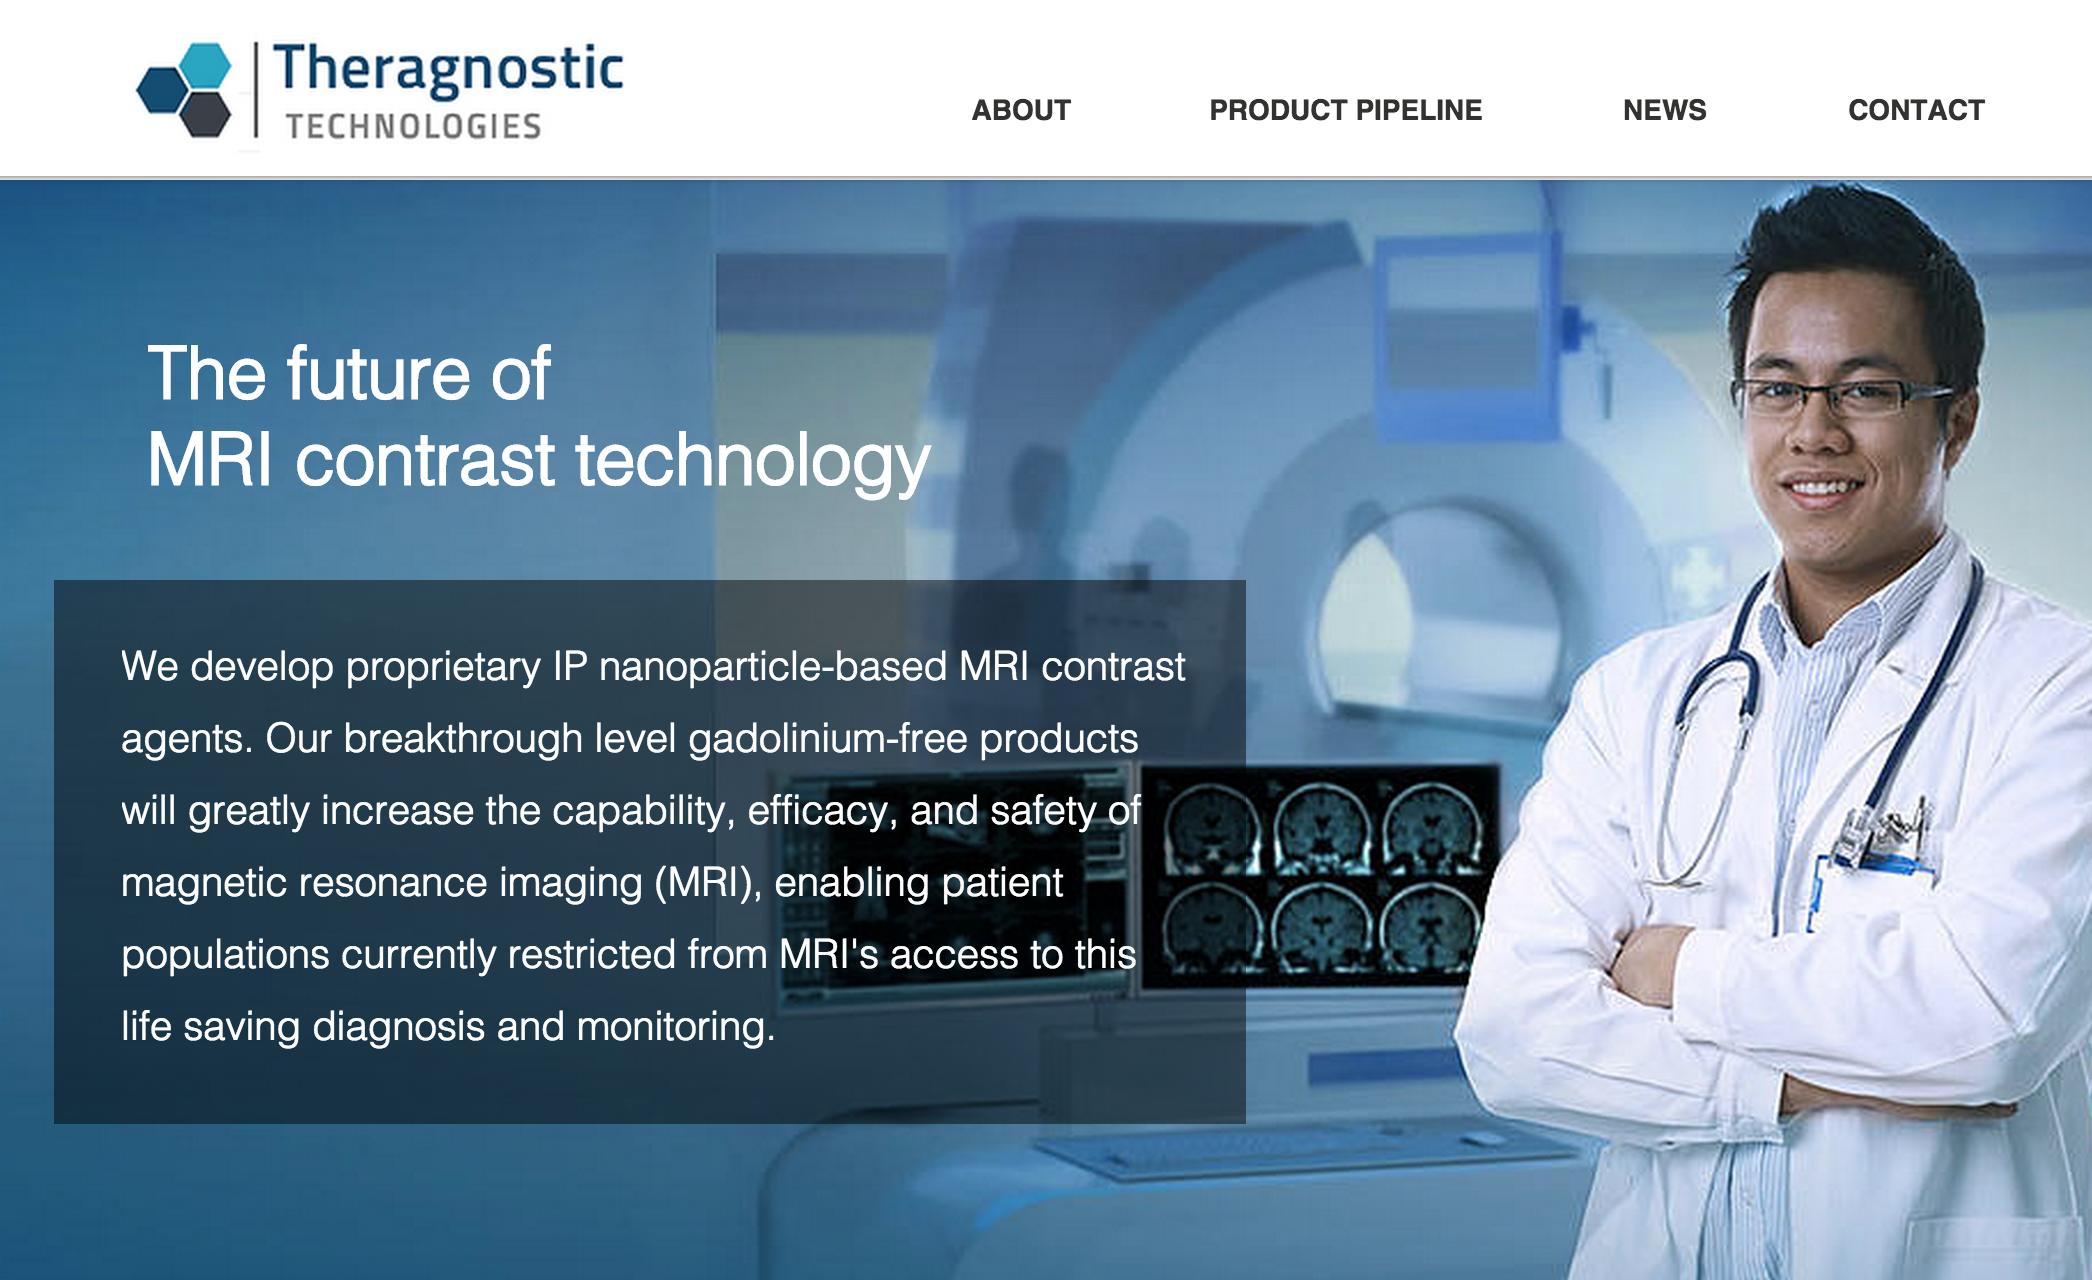 Theragnostic Technology develops proprietary IP